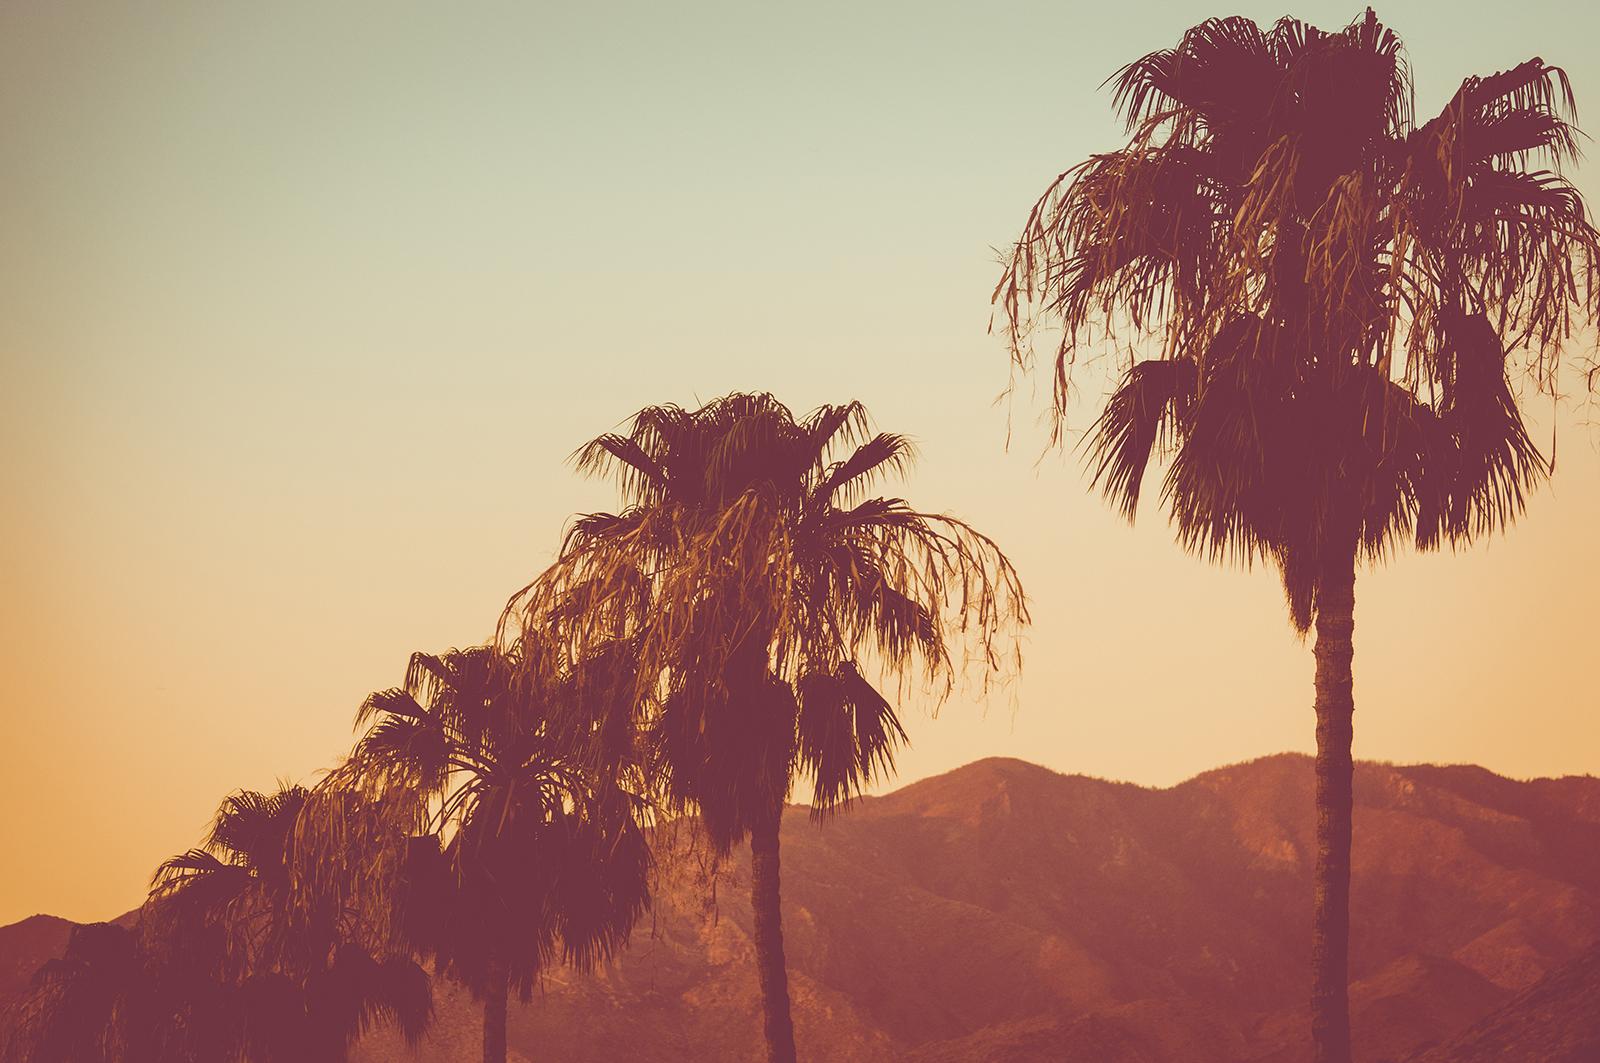 Coachella Valley Palm Trees